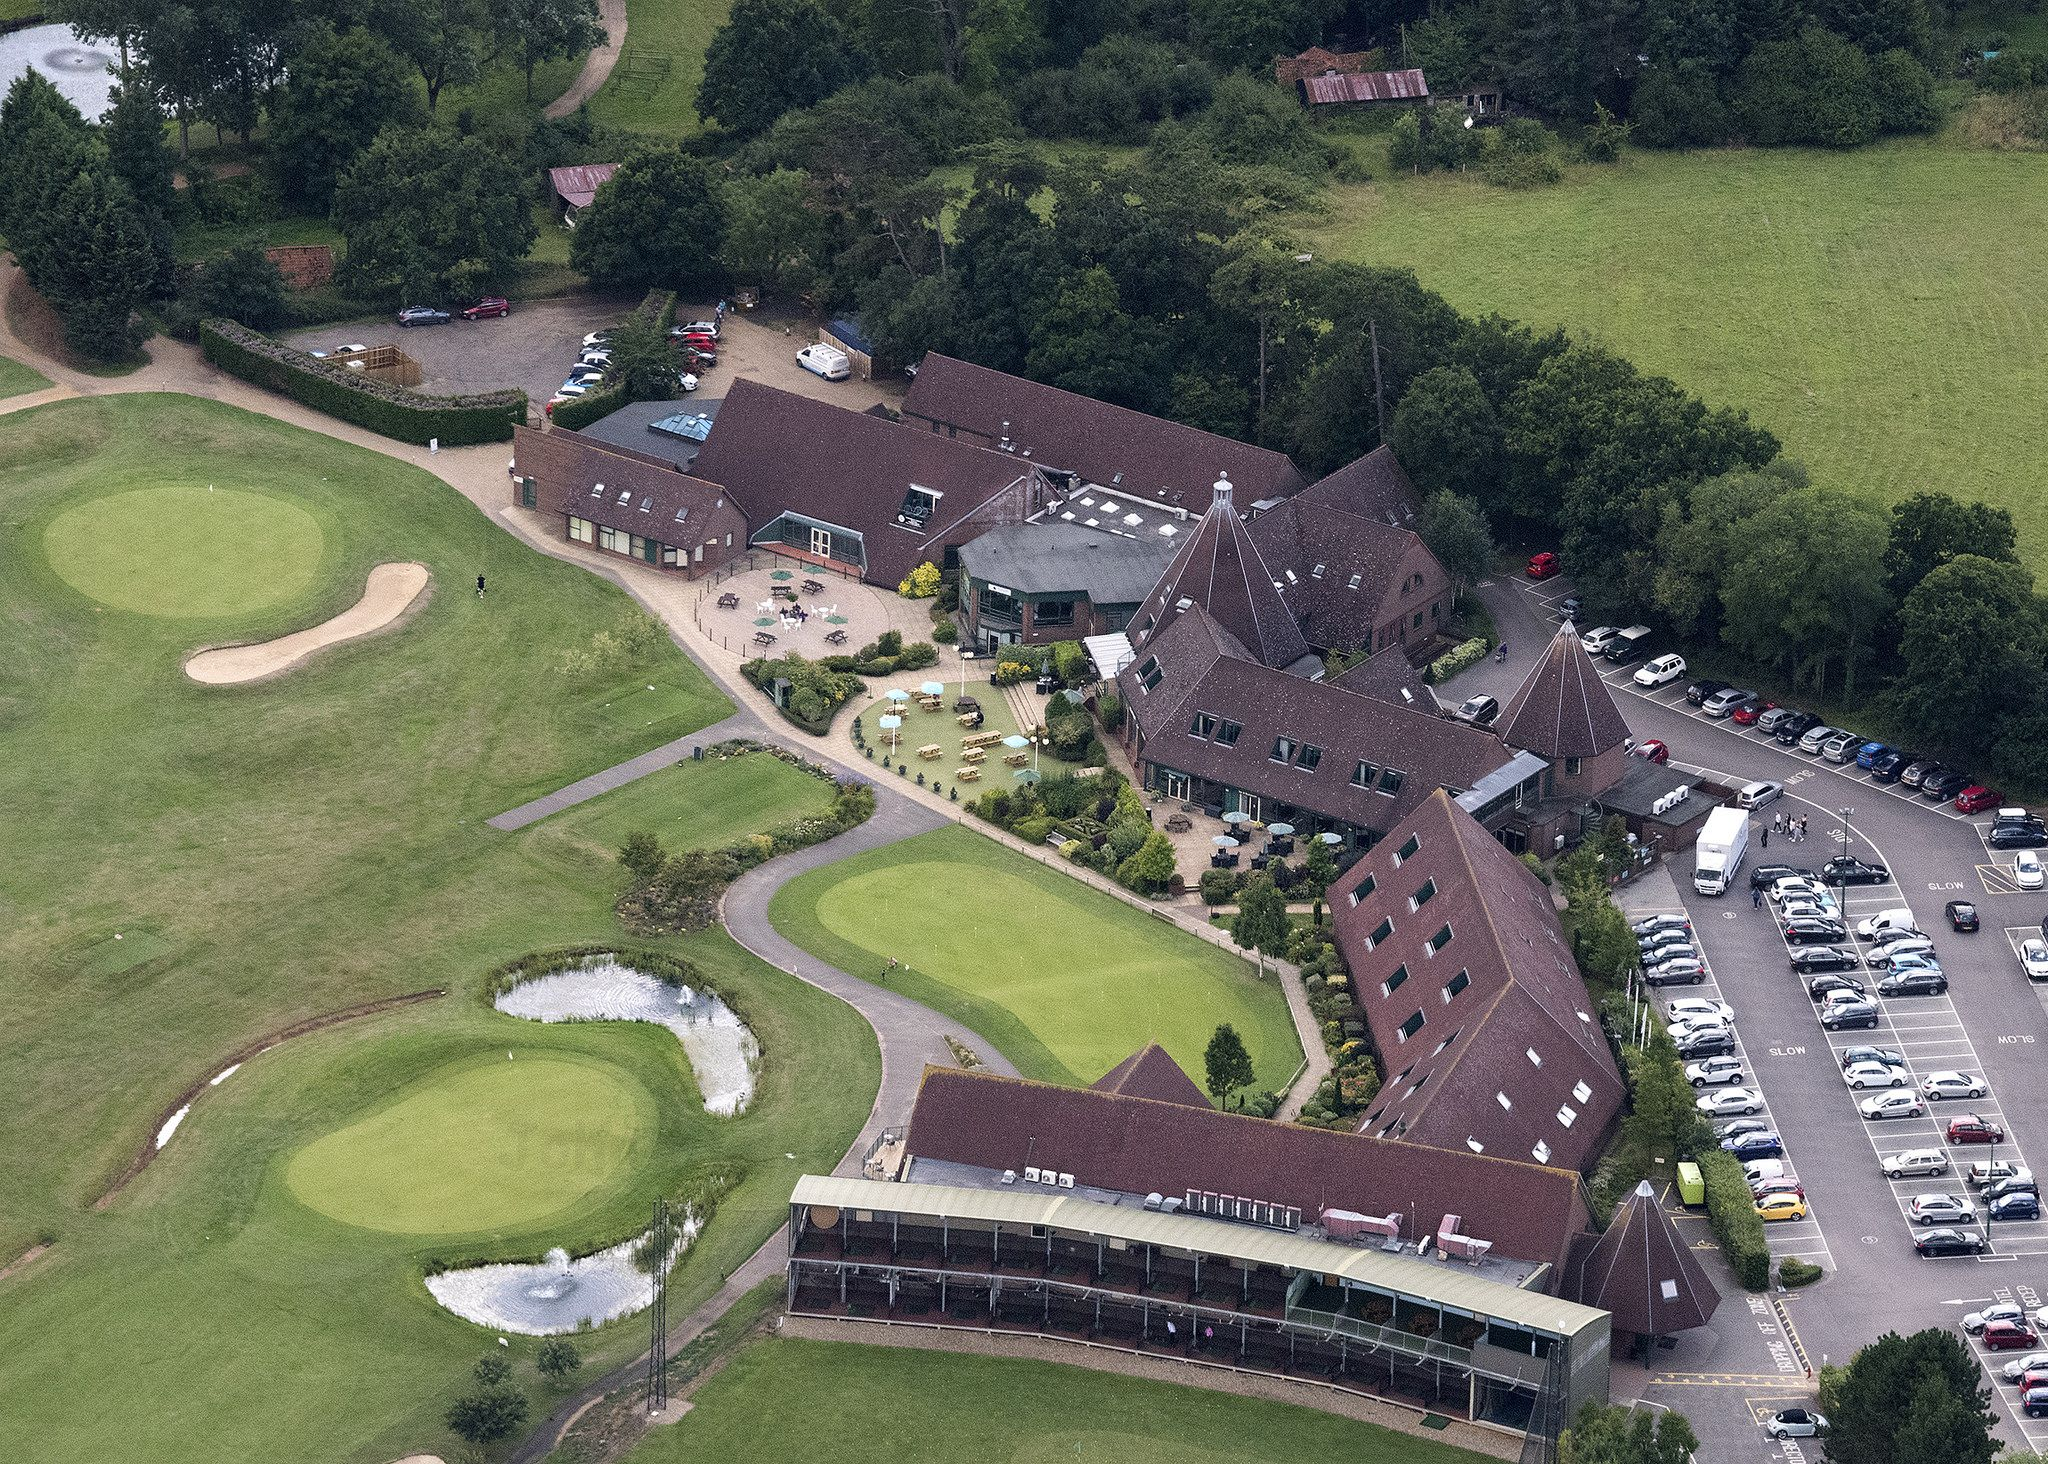 Ufford Park Golf Course In Suffolk Uk Aerial Image Golf Courses Golf Suffolk